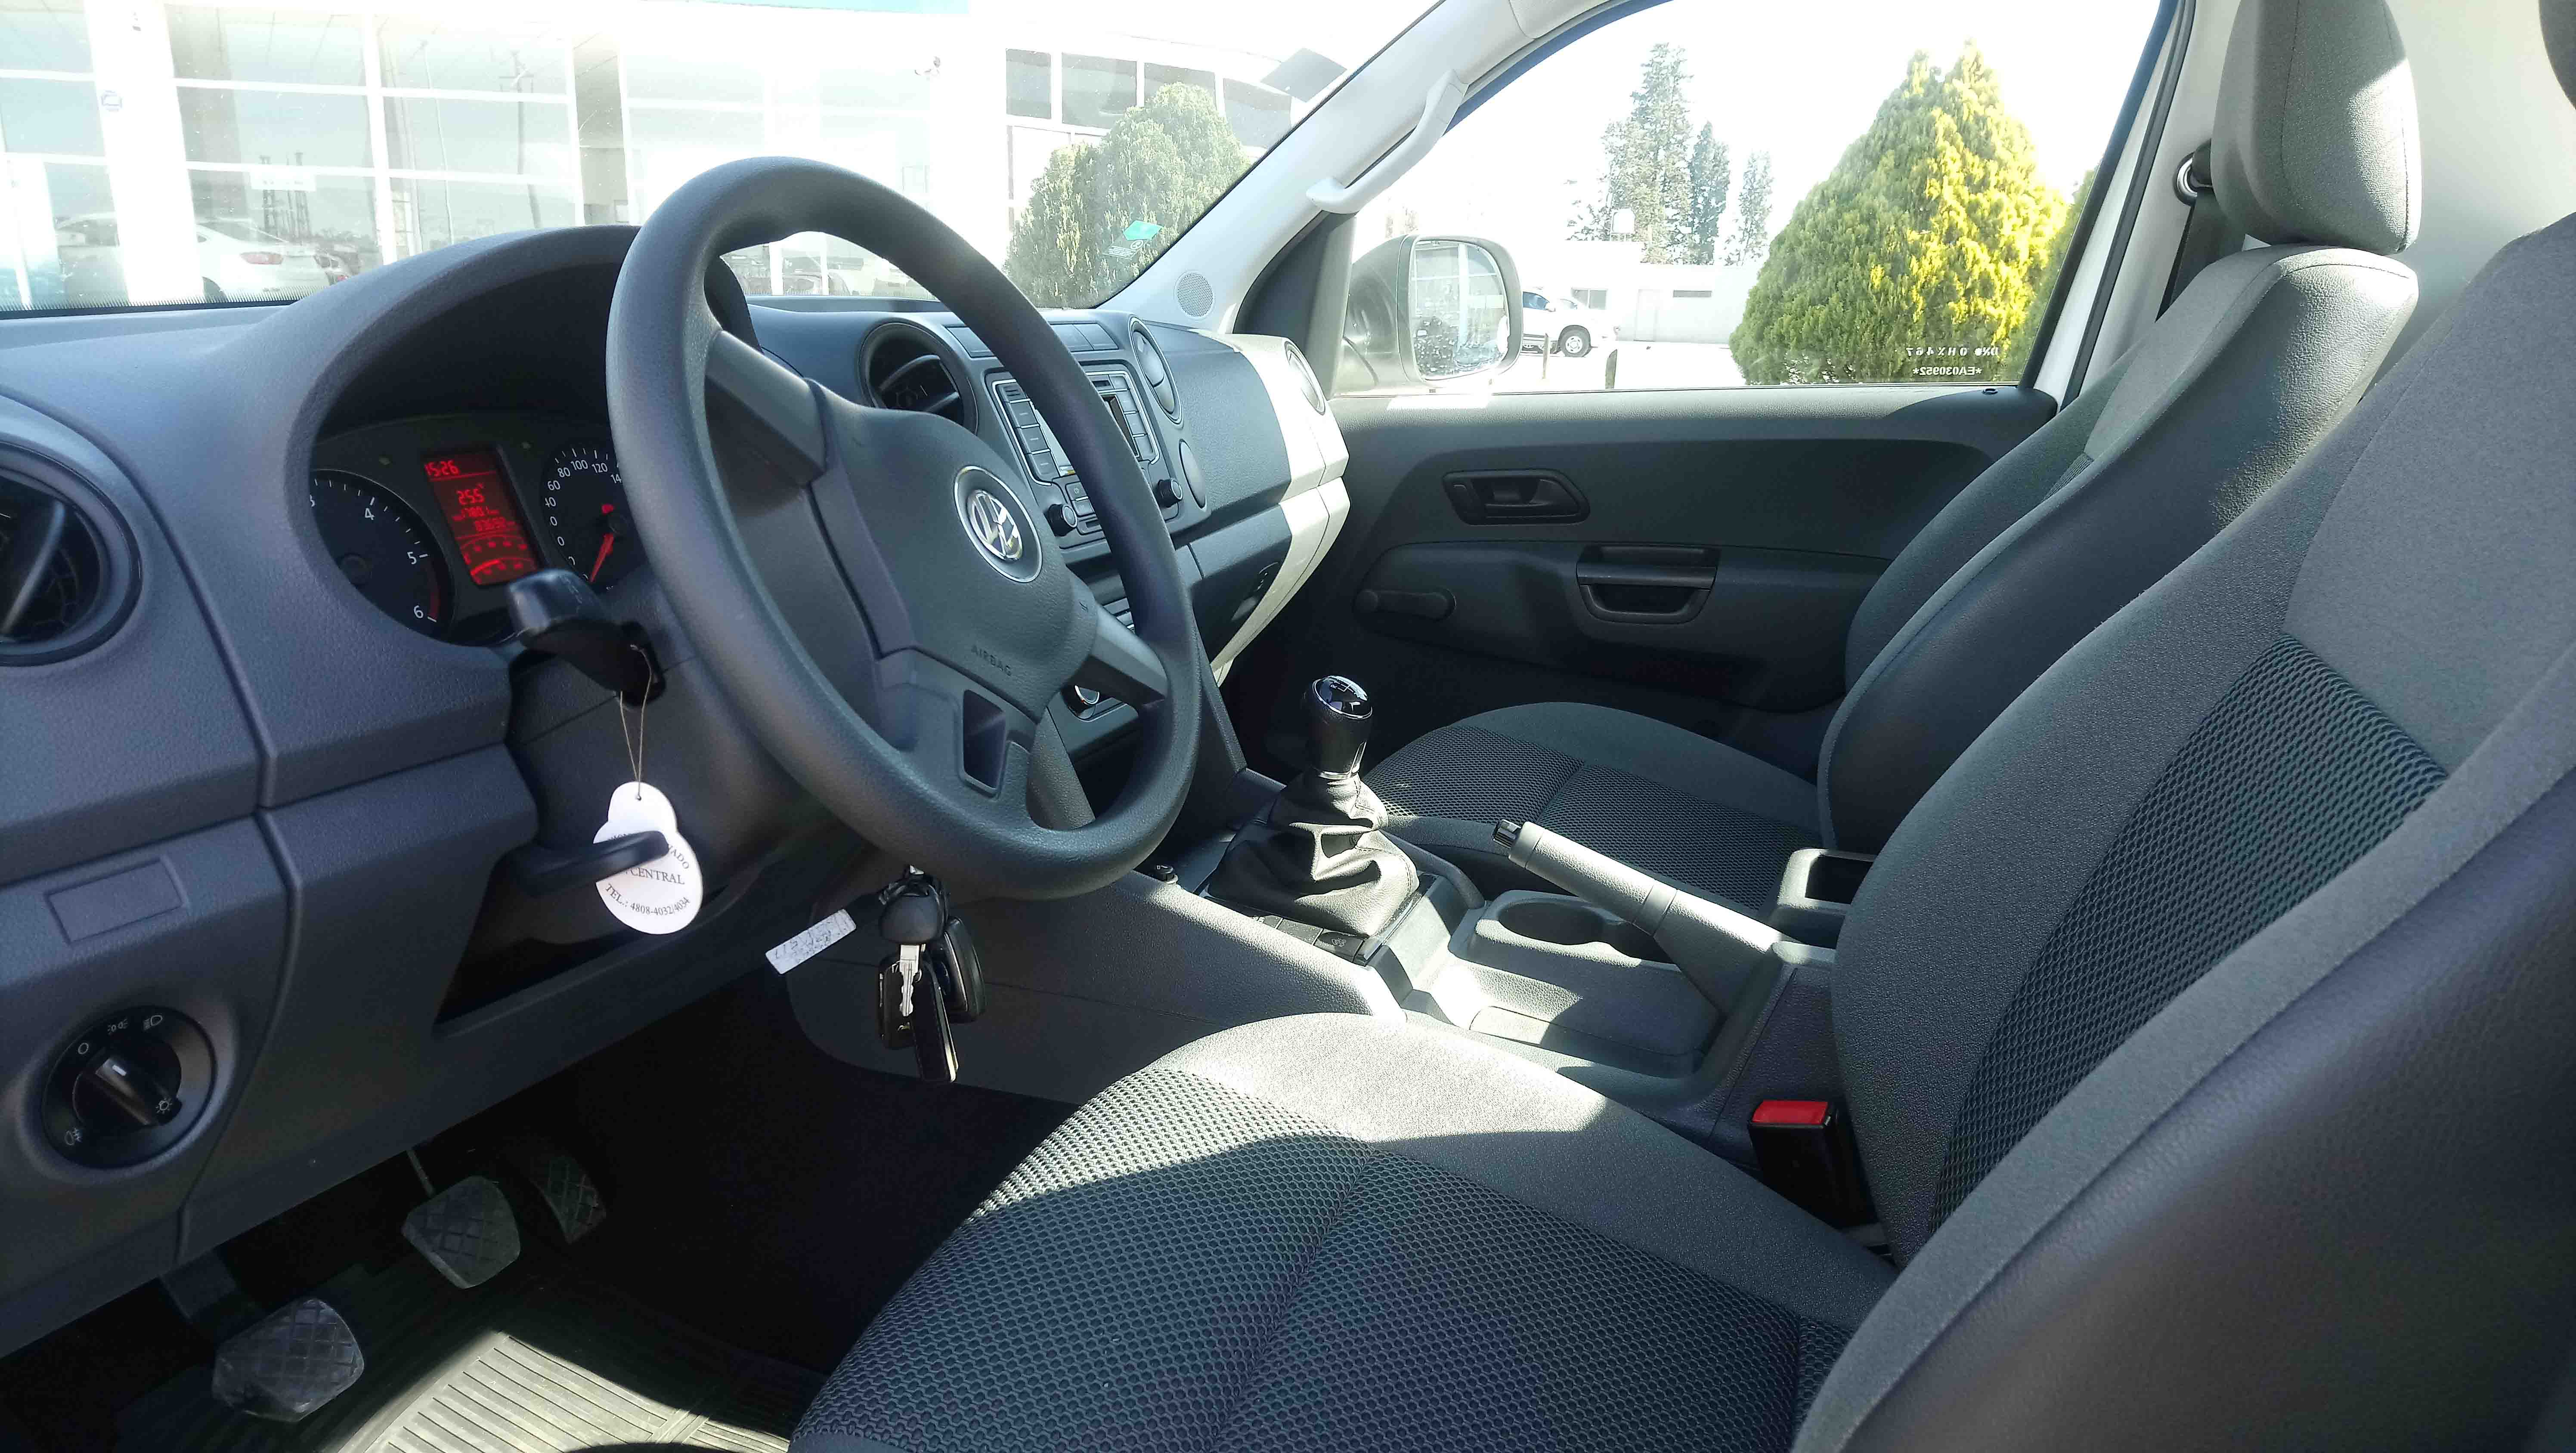 2014 Volkswagen Amarok 4x2 Cab Simple 2.0L